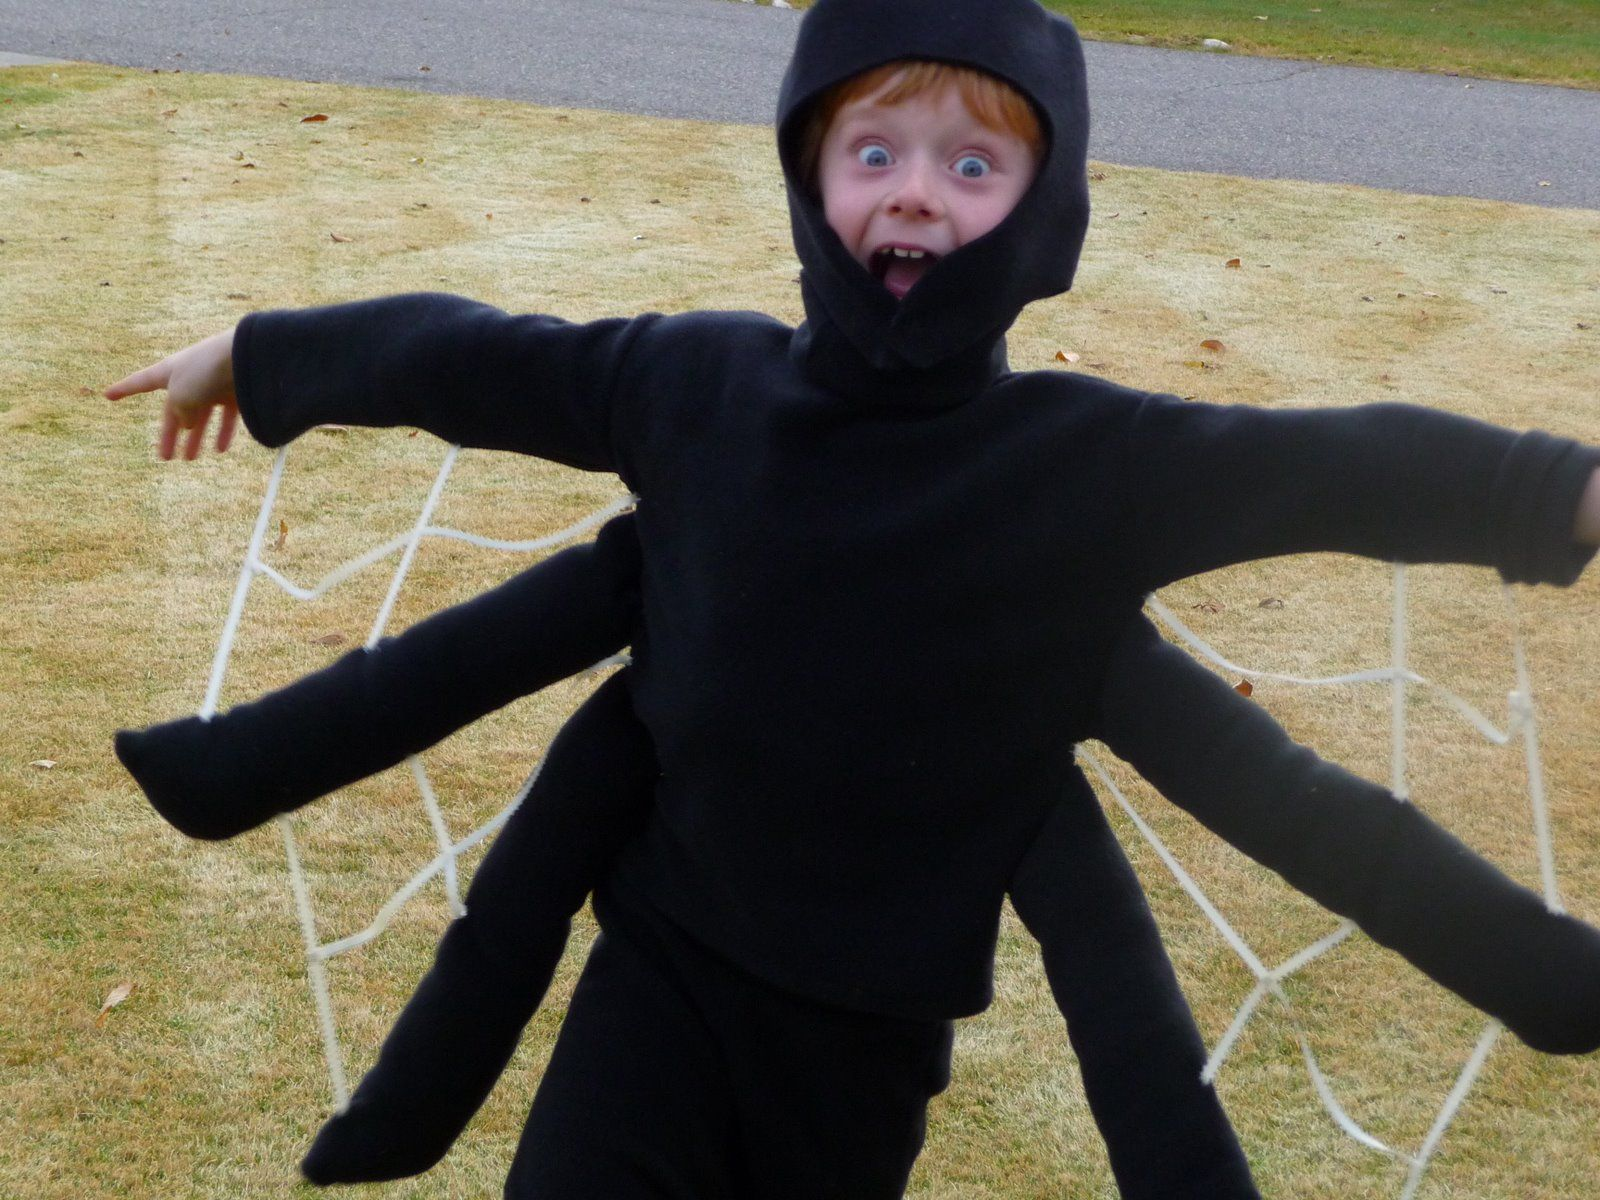 spider costume fasching pinterest kost m fasching und gruppe. Black Bedroom Furniture Sets. Home Design Ideas